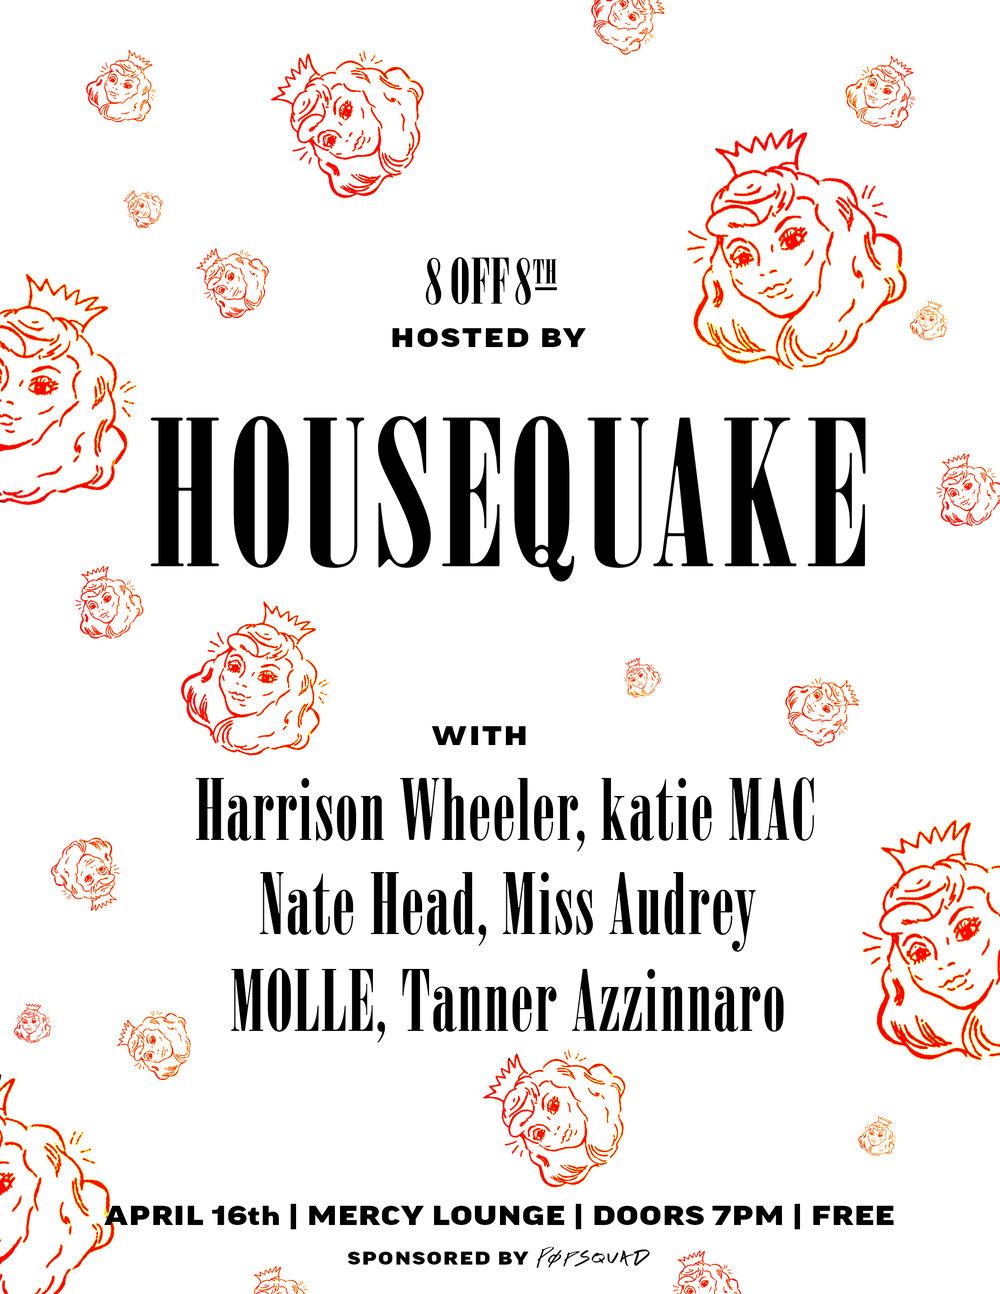 housequake-poster_2.jpg